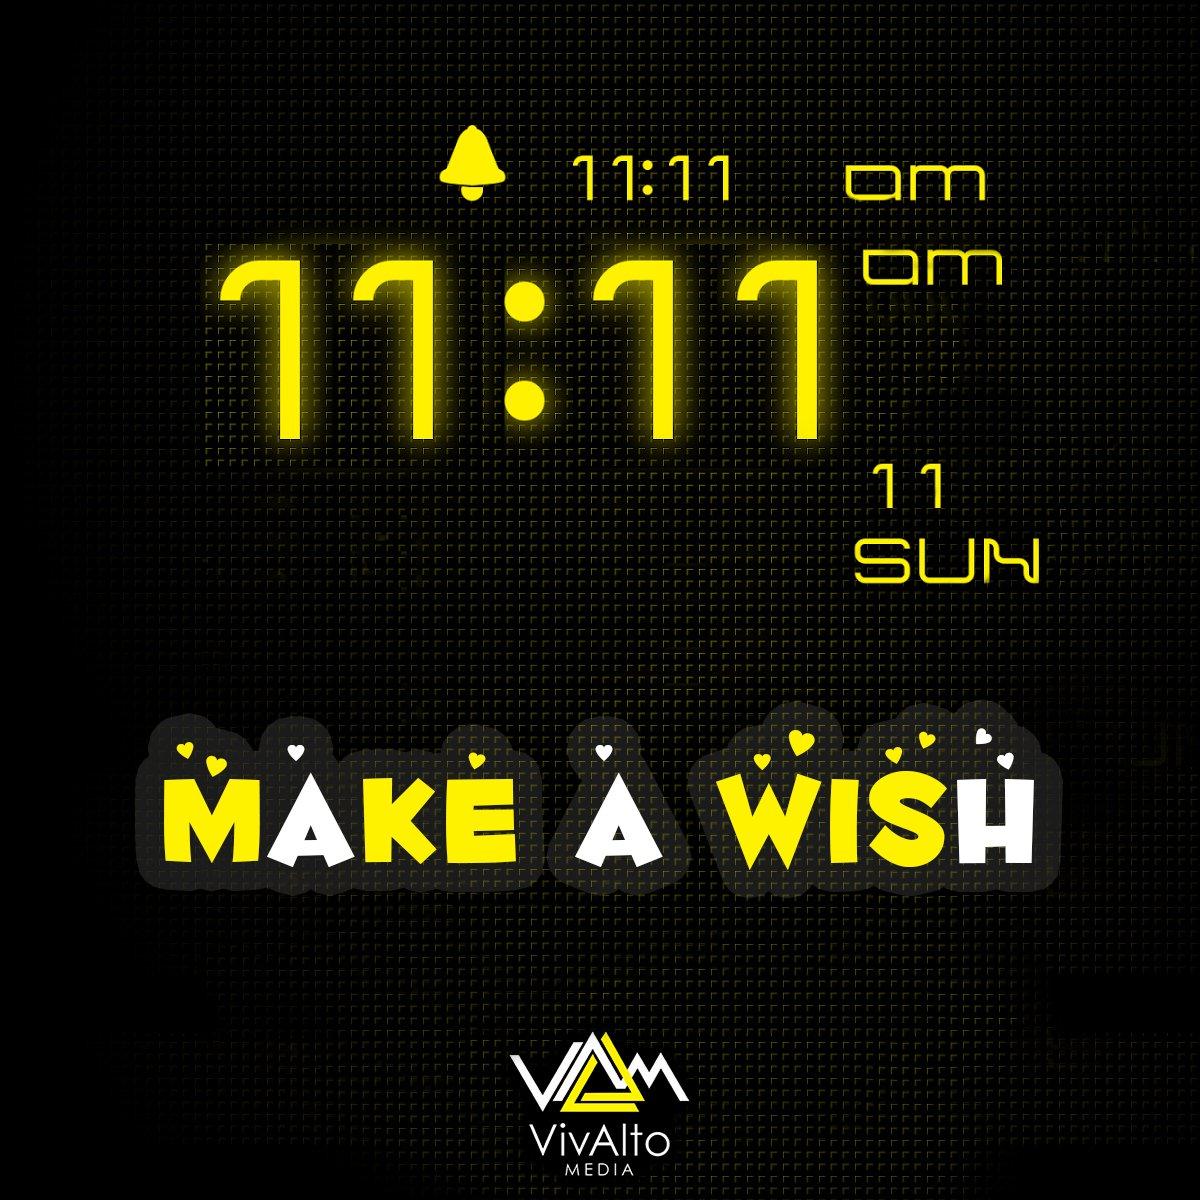 Make a wish, take a chance, make a change #wish #luck #TeamVivAlto #sunday #VivAltoMediapic.twitter.com/qU9A50GEXA